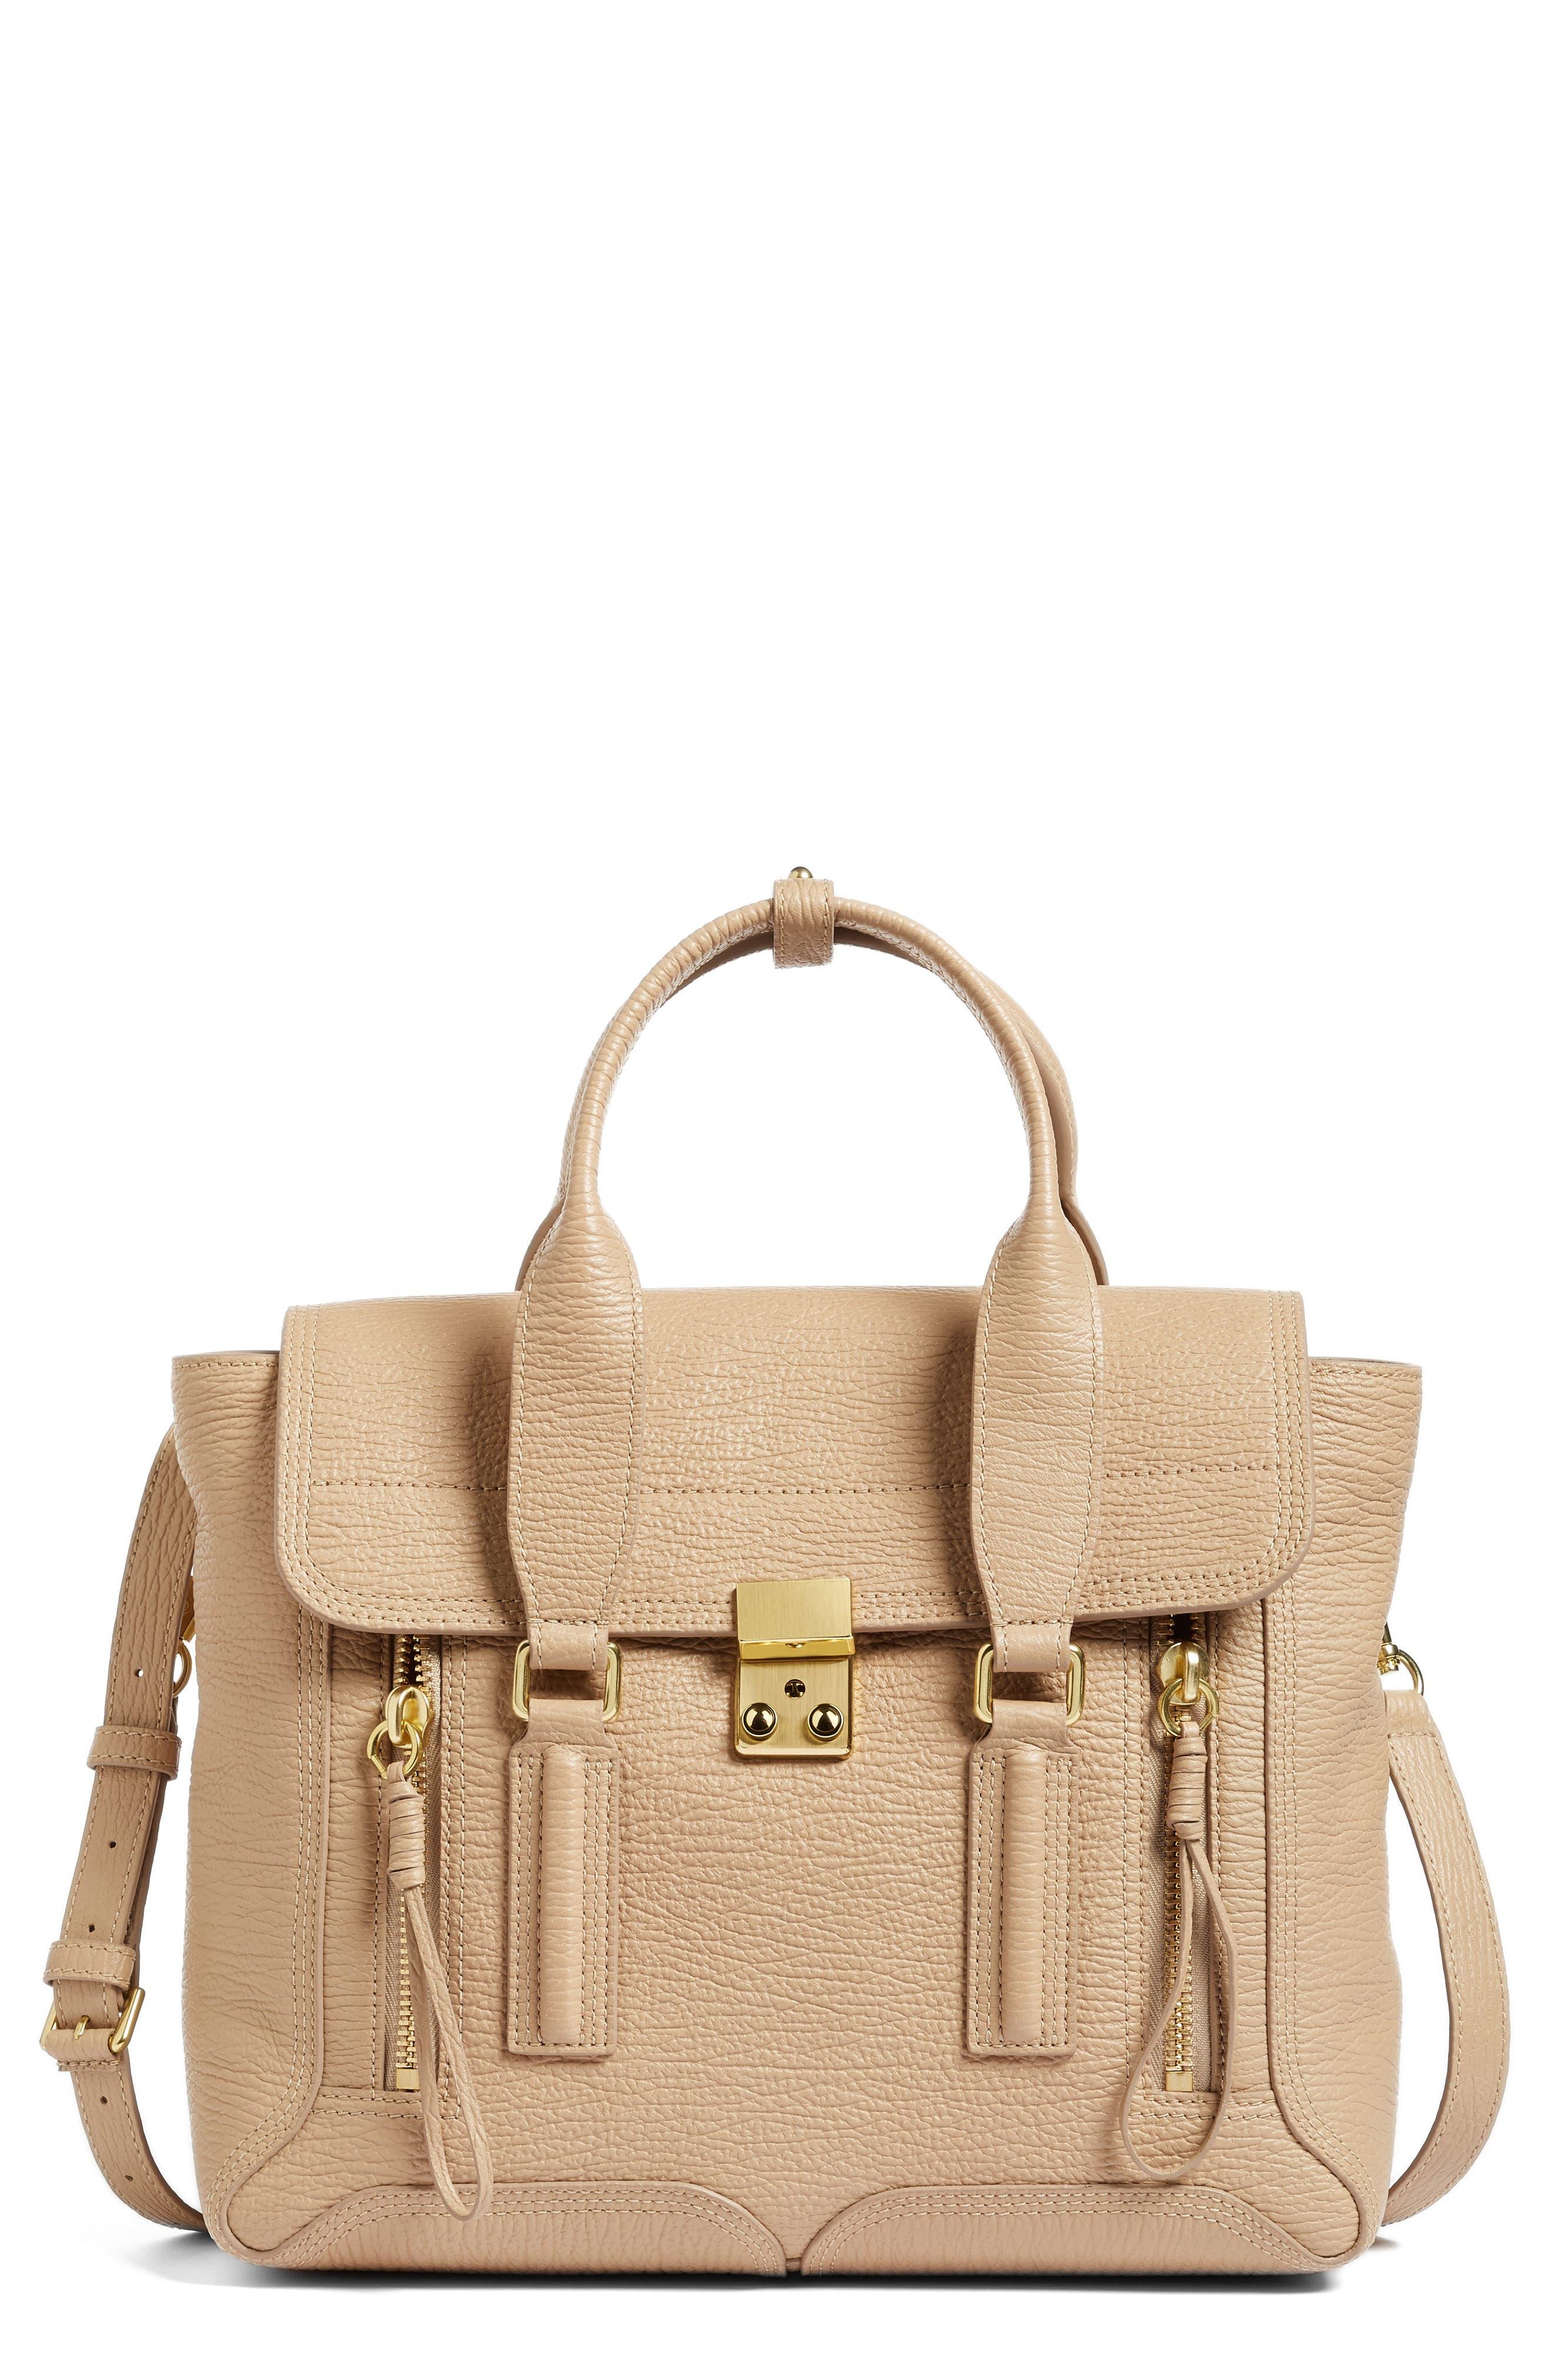 Alternate Image 1 Selected - 3.1 Phillip Lim Medium Pashli Leather Satchel